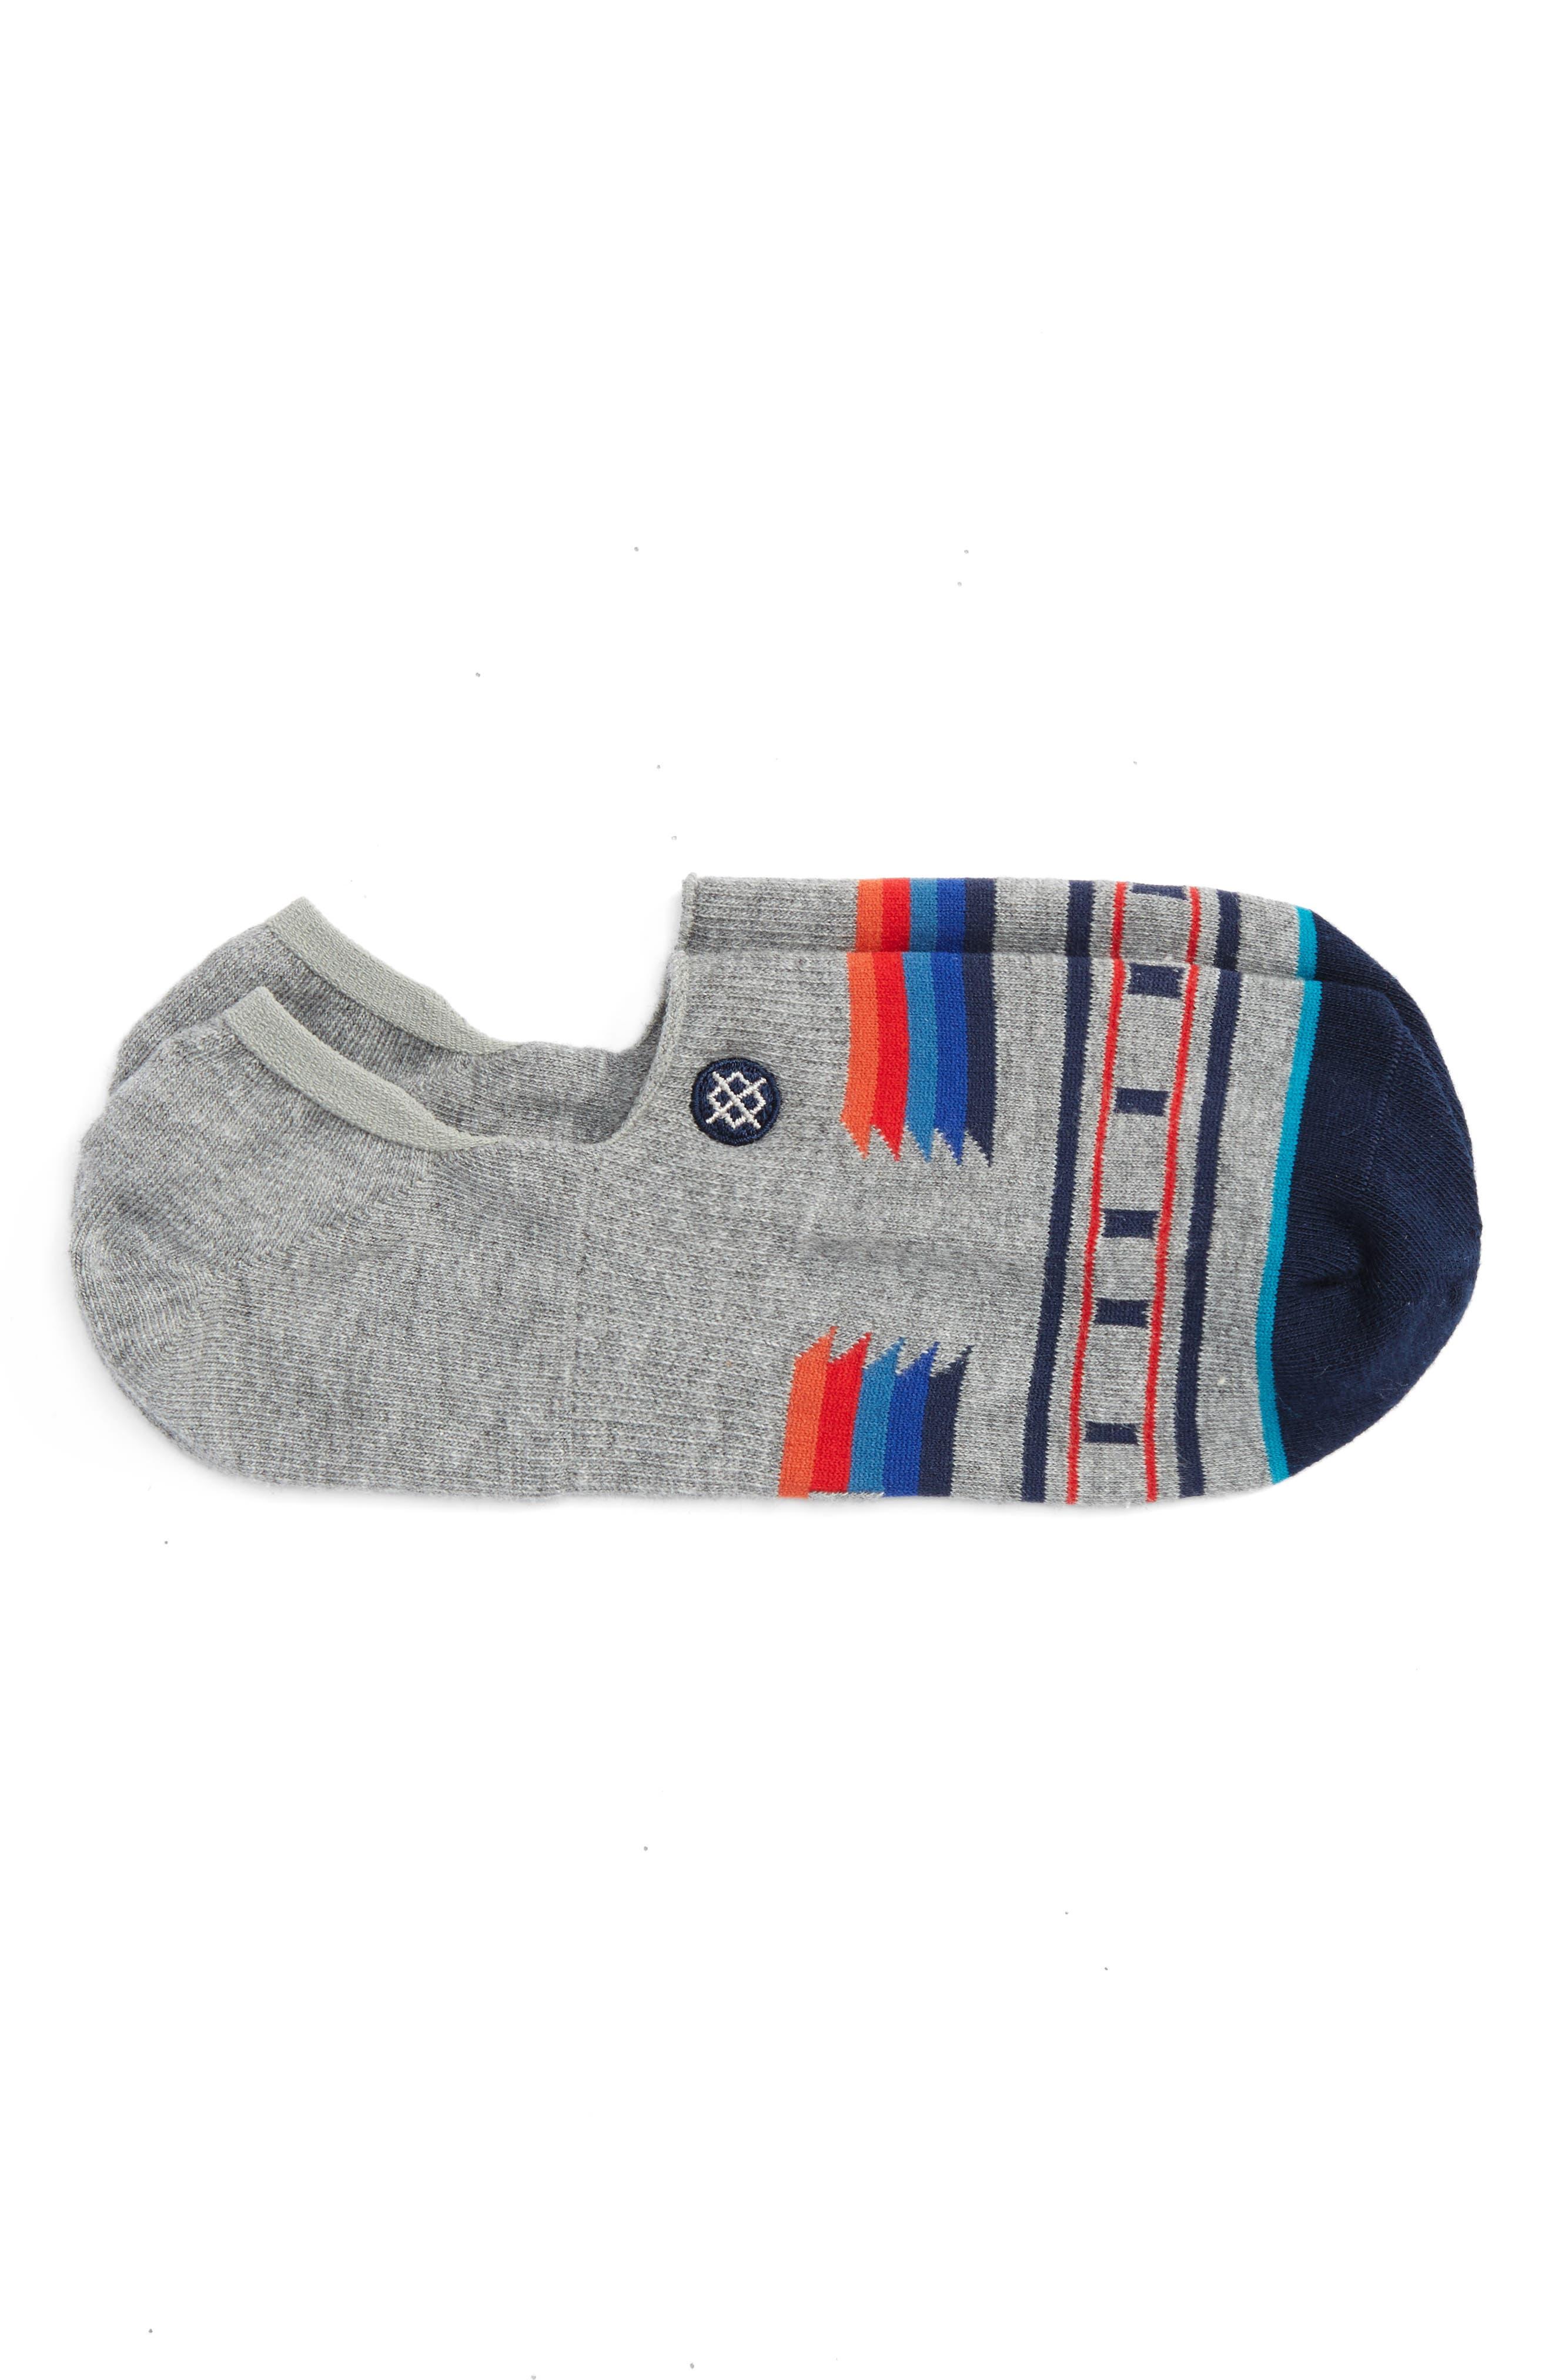 Alum No-Show Socks,                             Main thumbnail 1, color,                             Grey